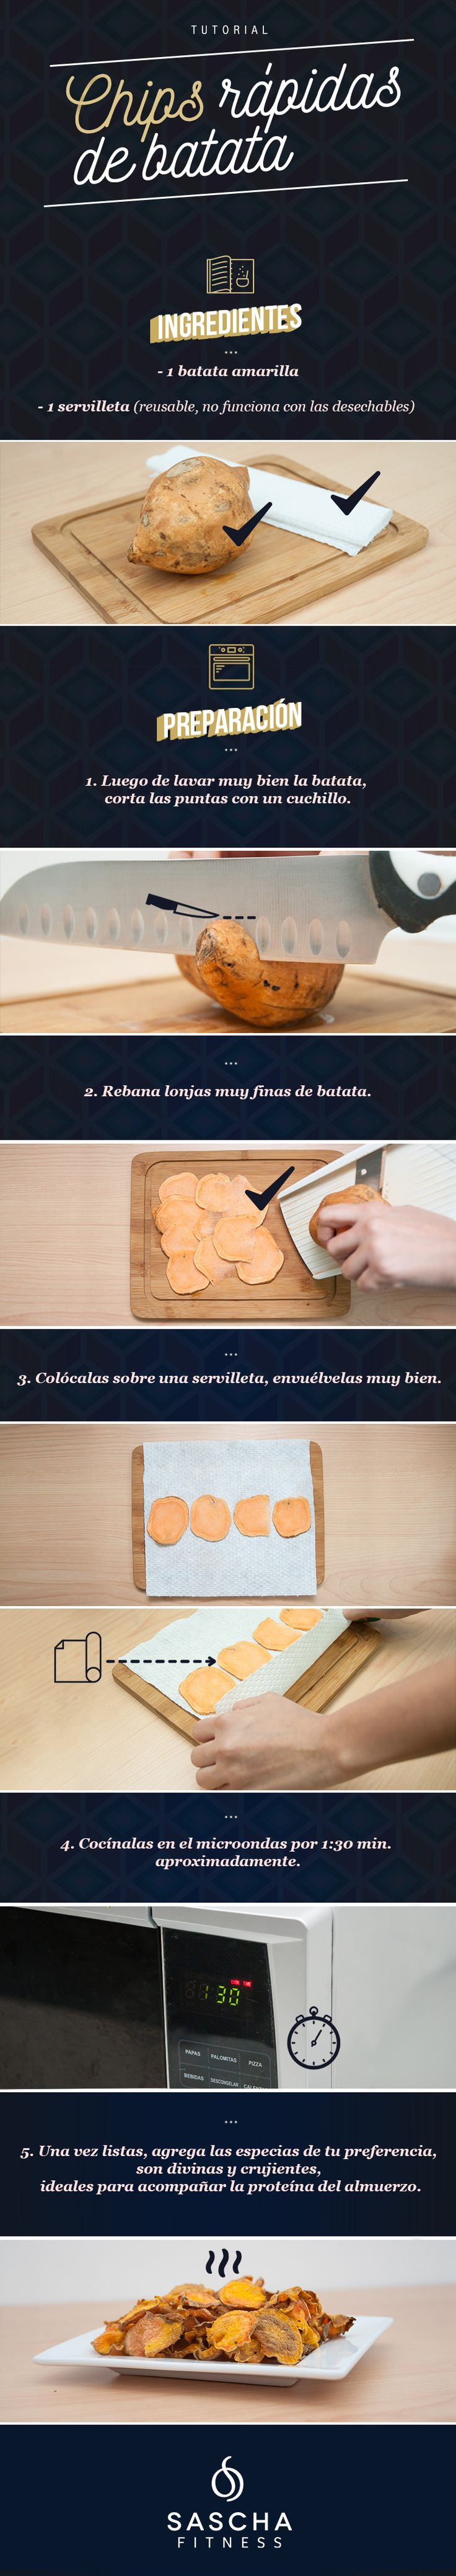 Tutorial: chips rápidas de batata - Sascha Fitness